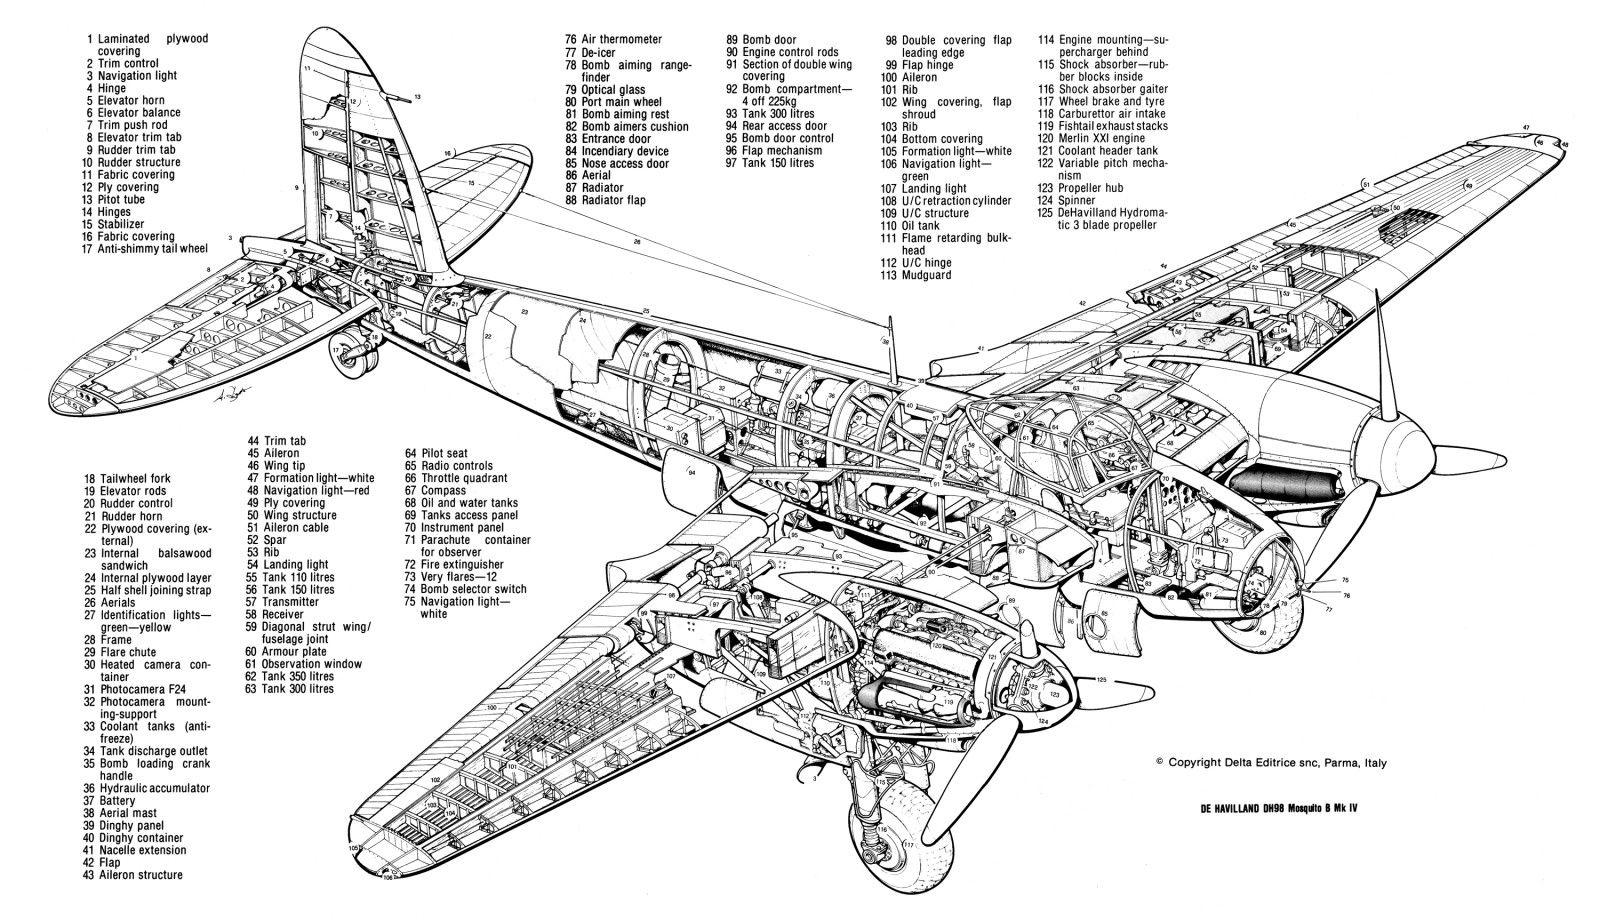 Pin by Michael Roskam on cutaway | Cutaway, Bomber plane